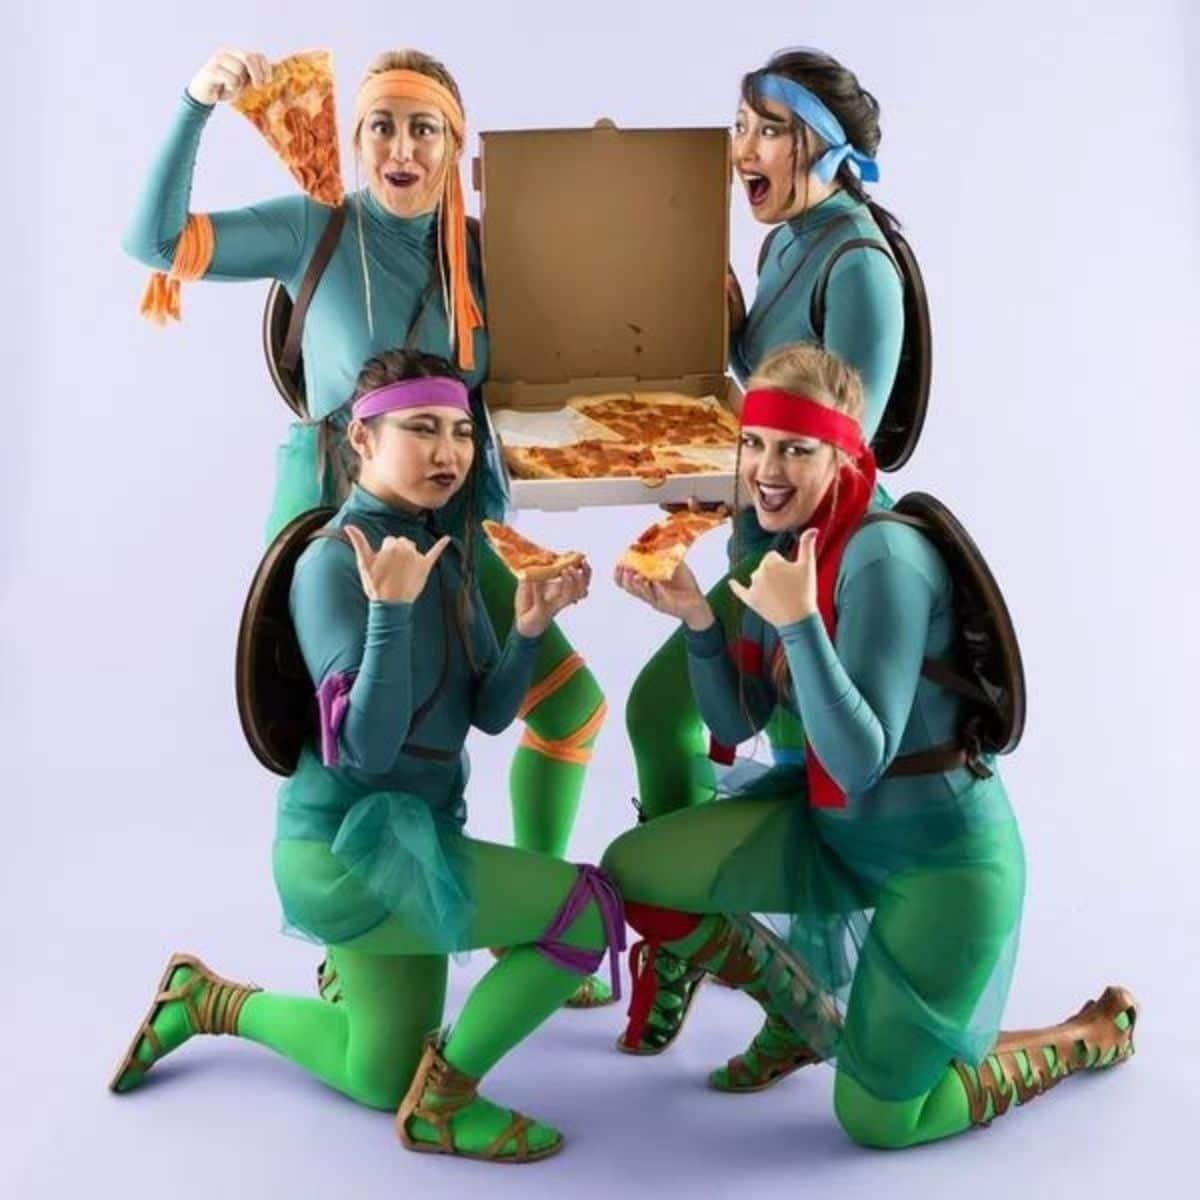 4 girls dressed up as the teenage mutant ninja turtles holding pizza